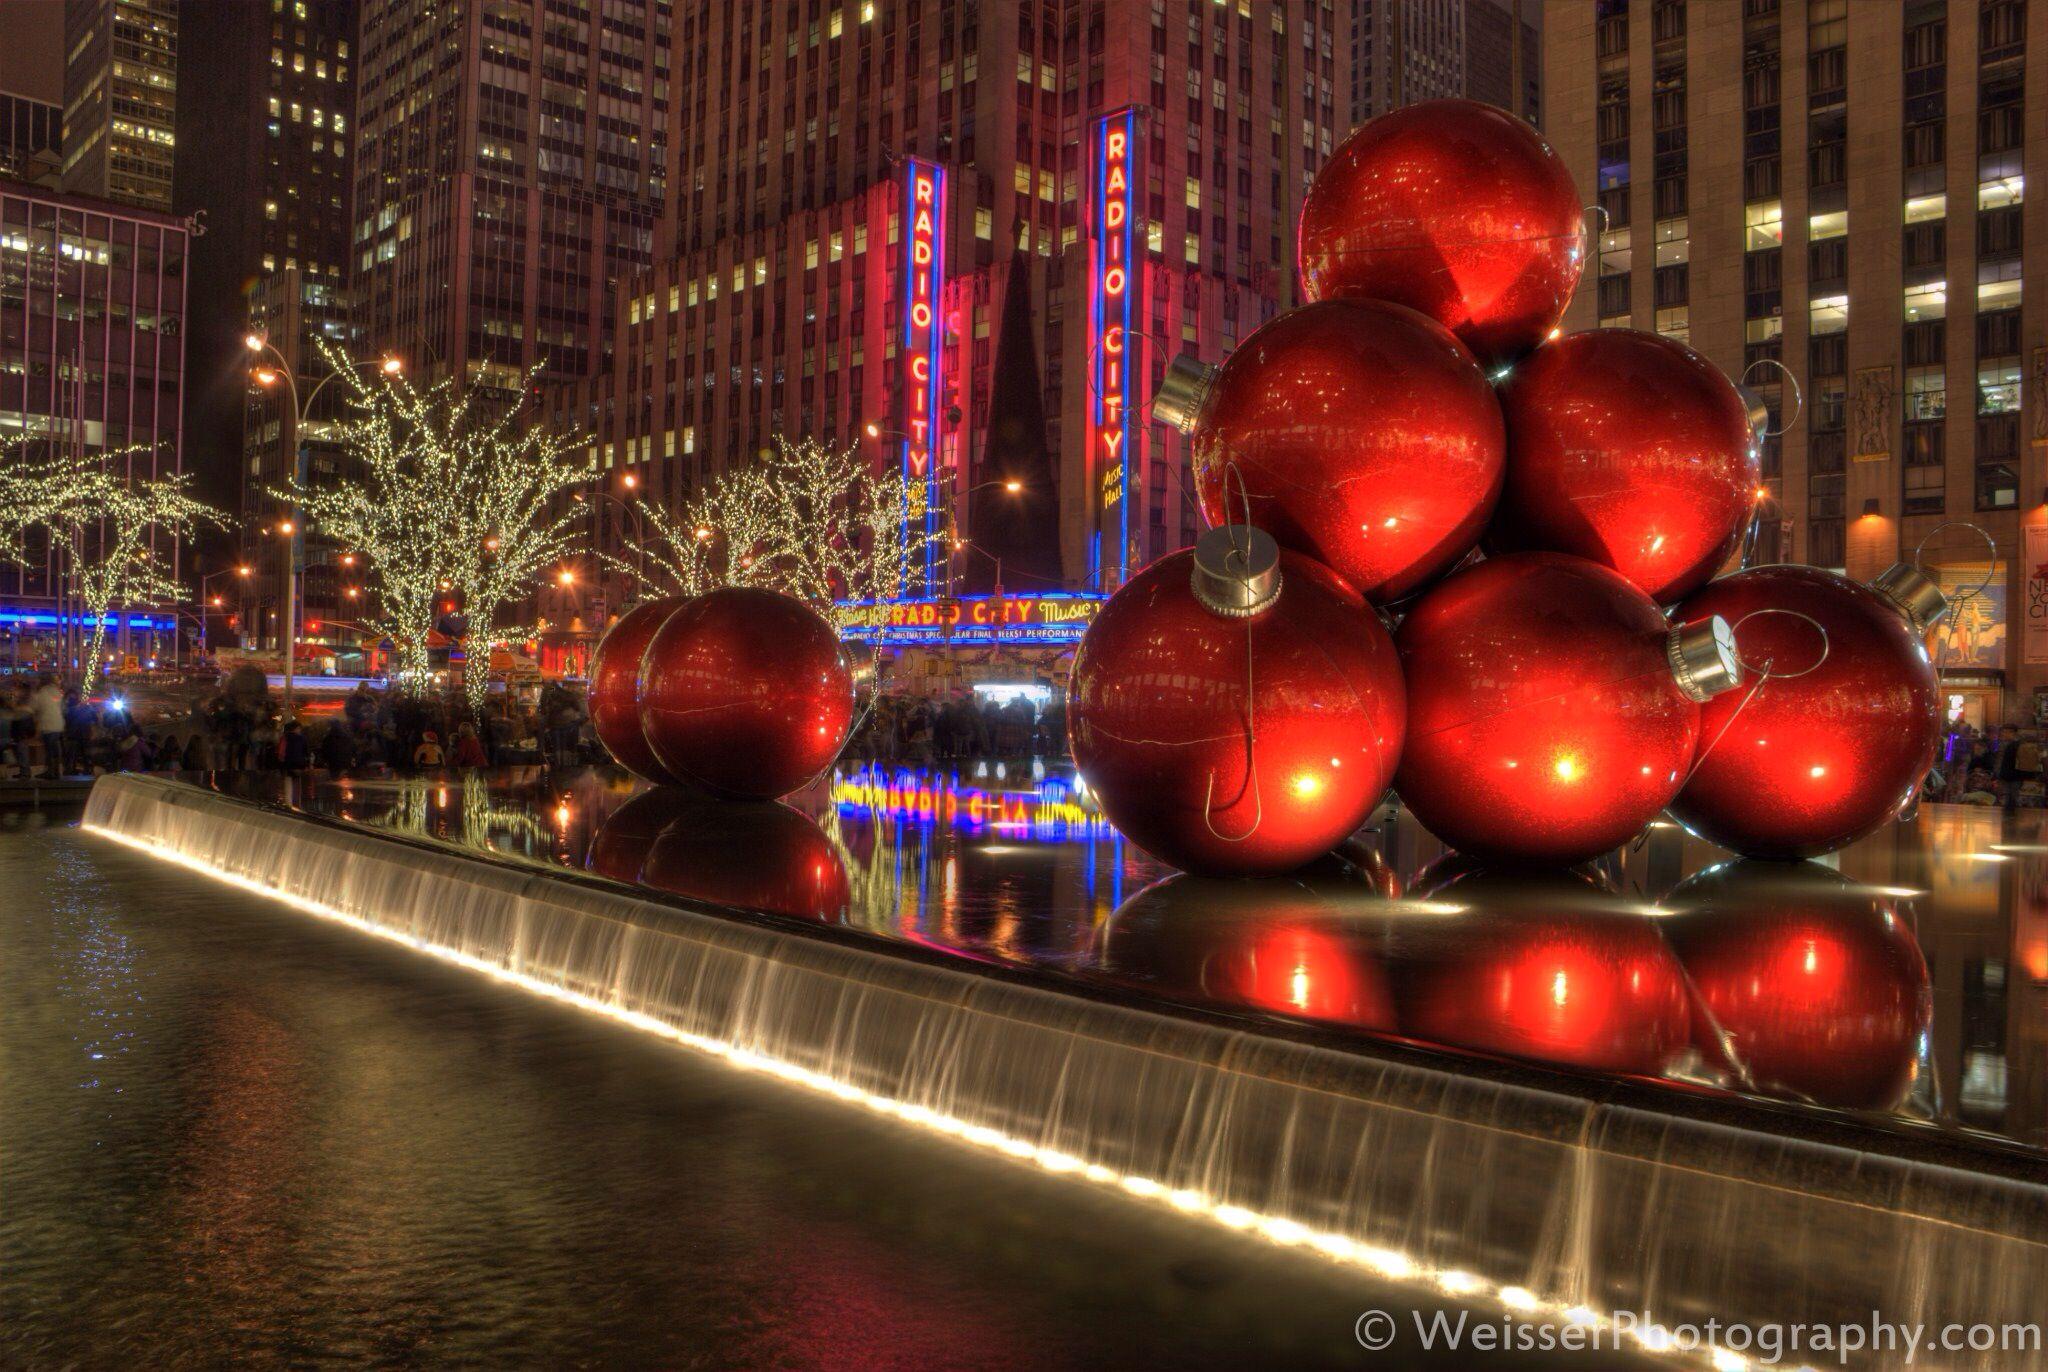 Radio City Music Hall Christmas Ornaments | Christmas in New York ...